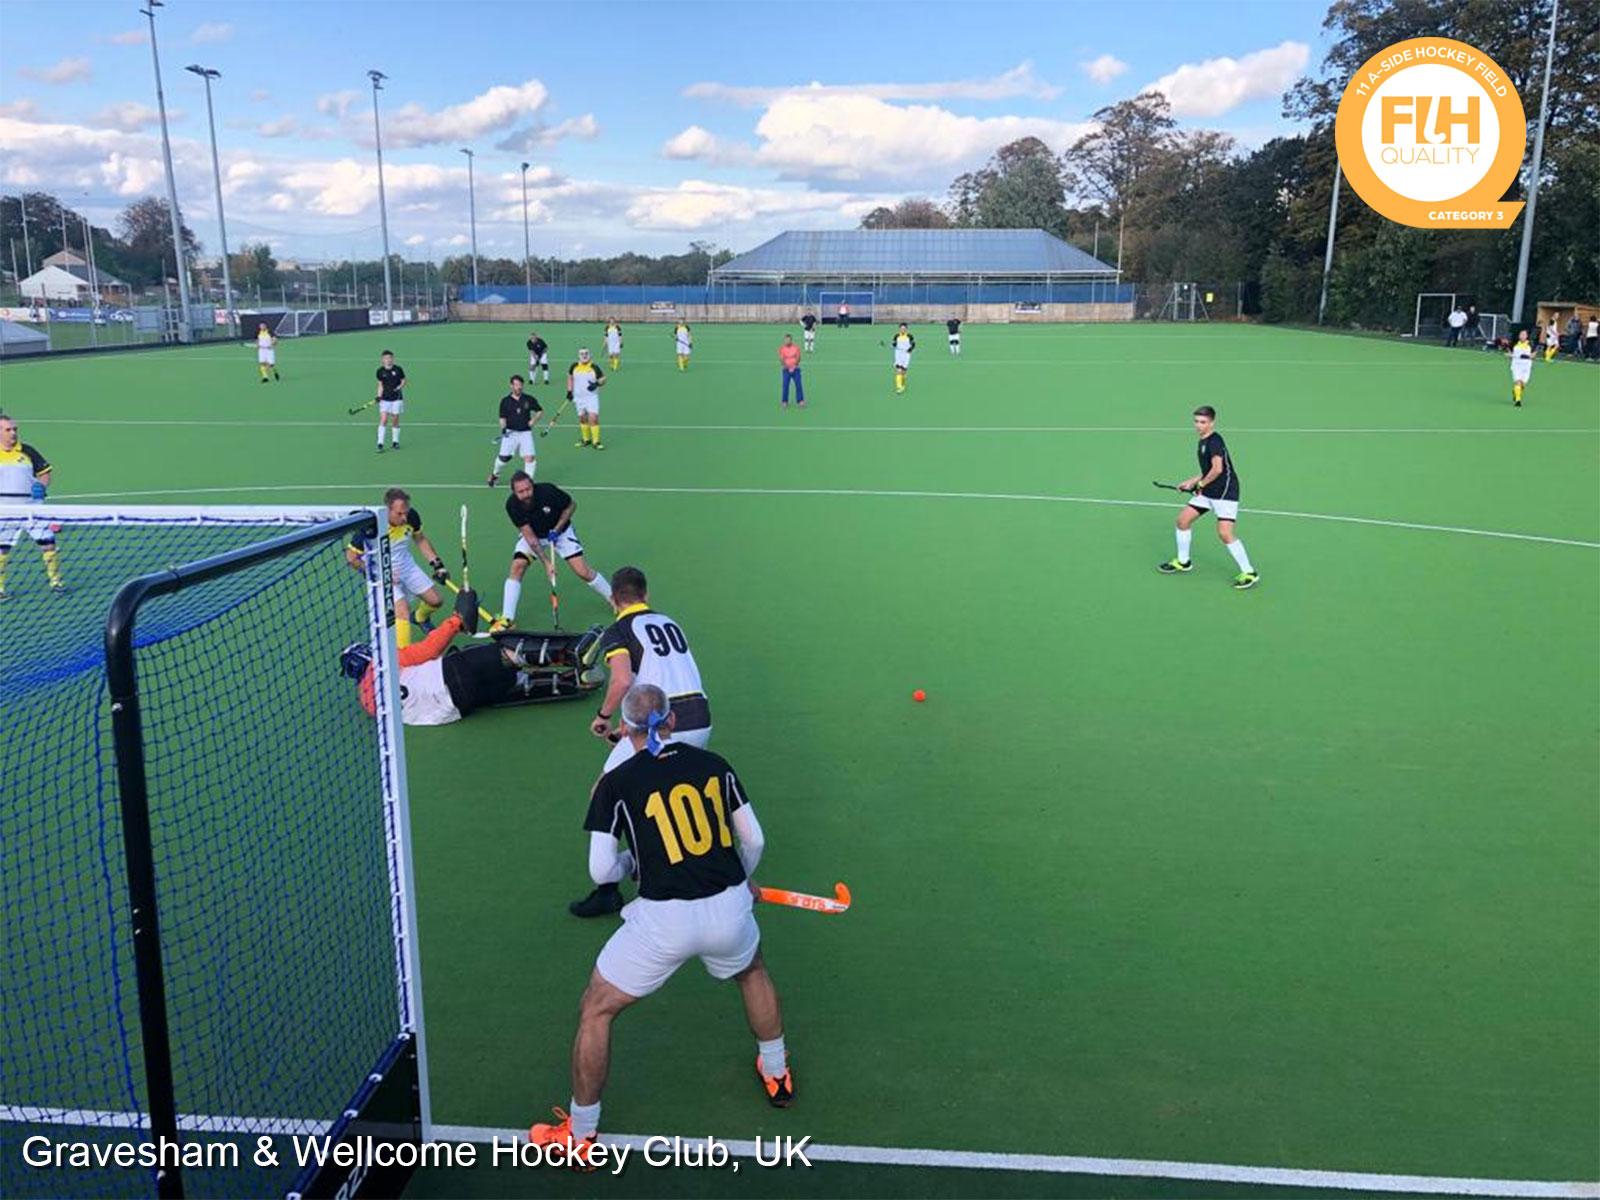 Gravesham & Wellcome Hockey Club